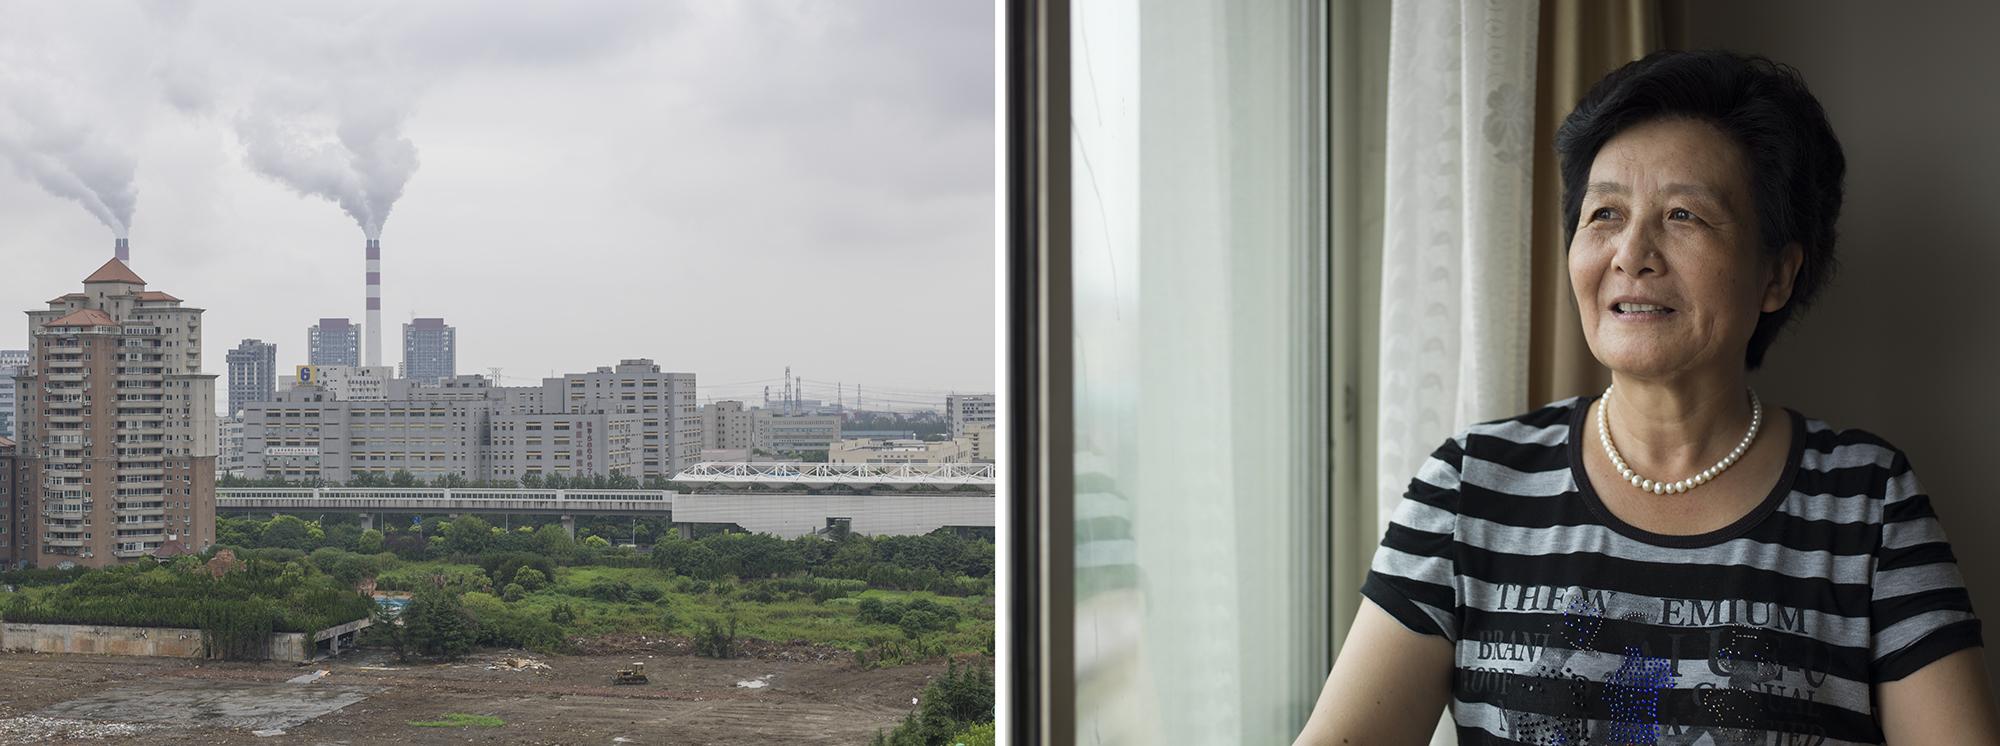 Neighbors project SHANGHAI - CHINE